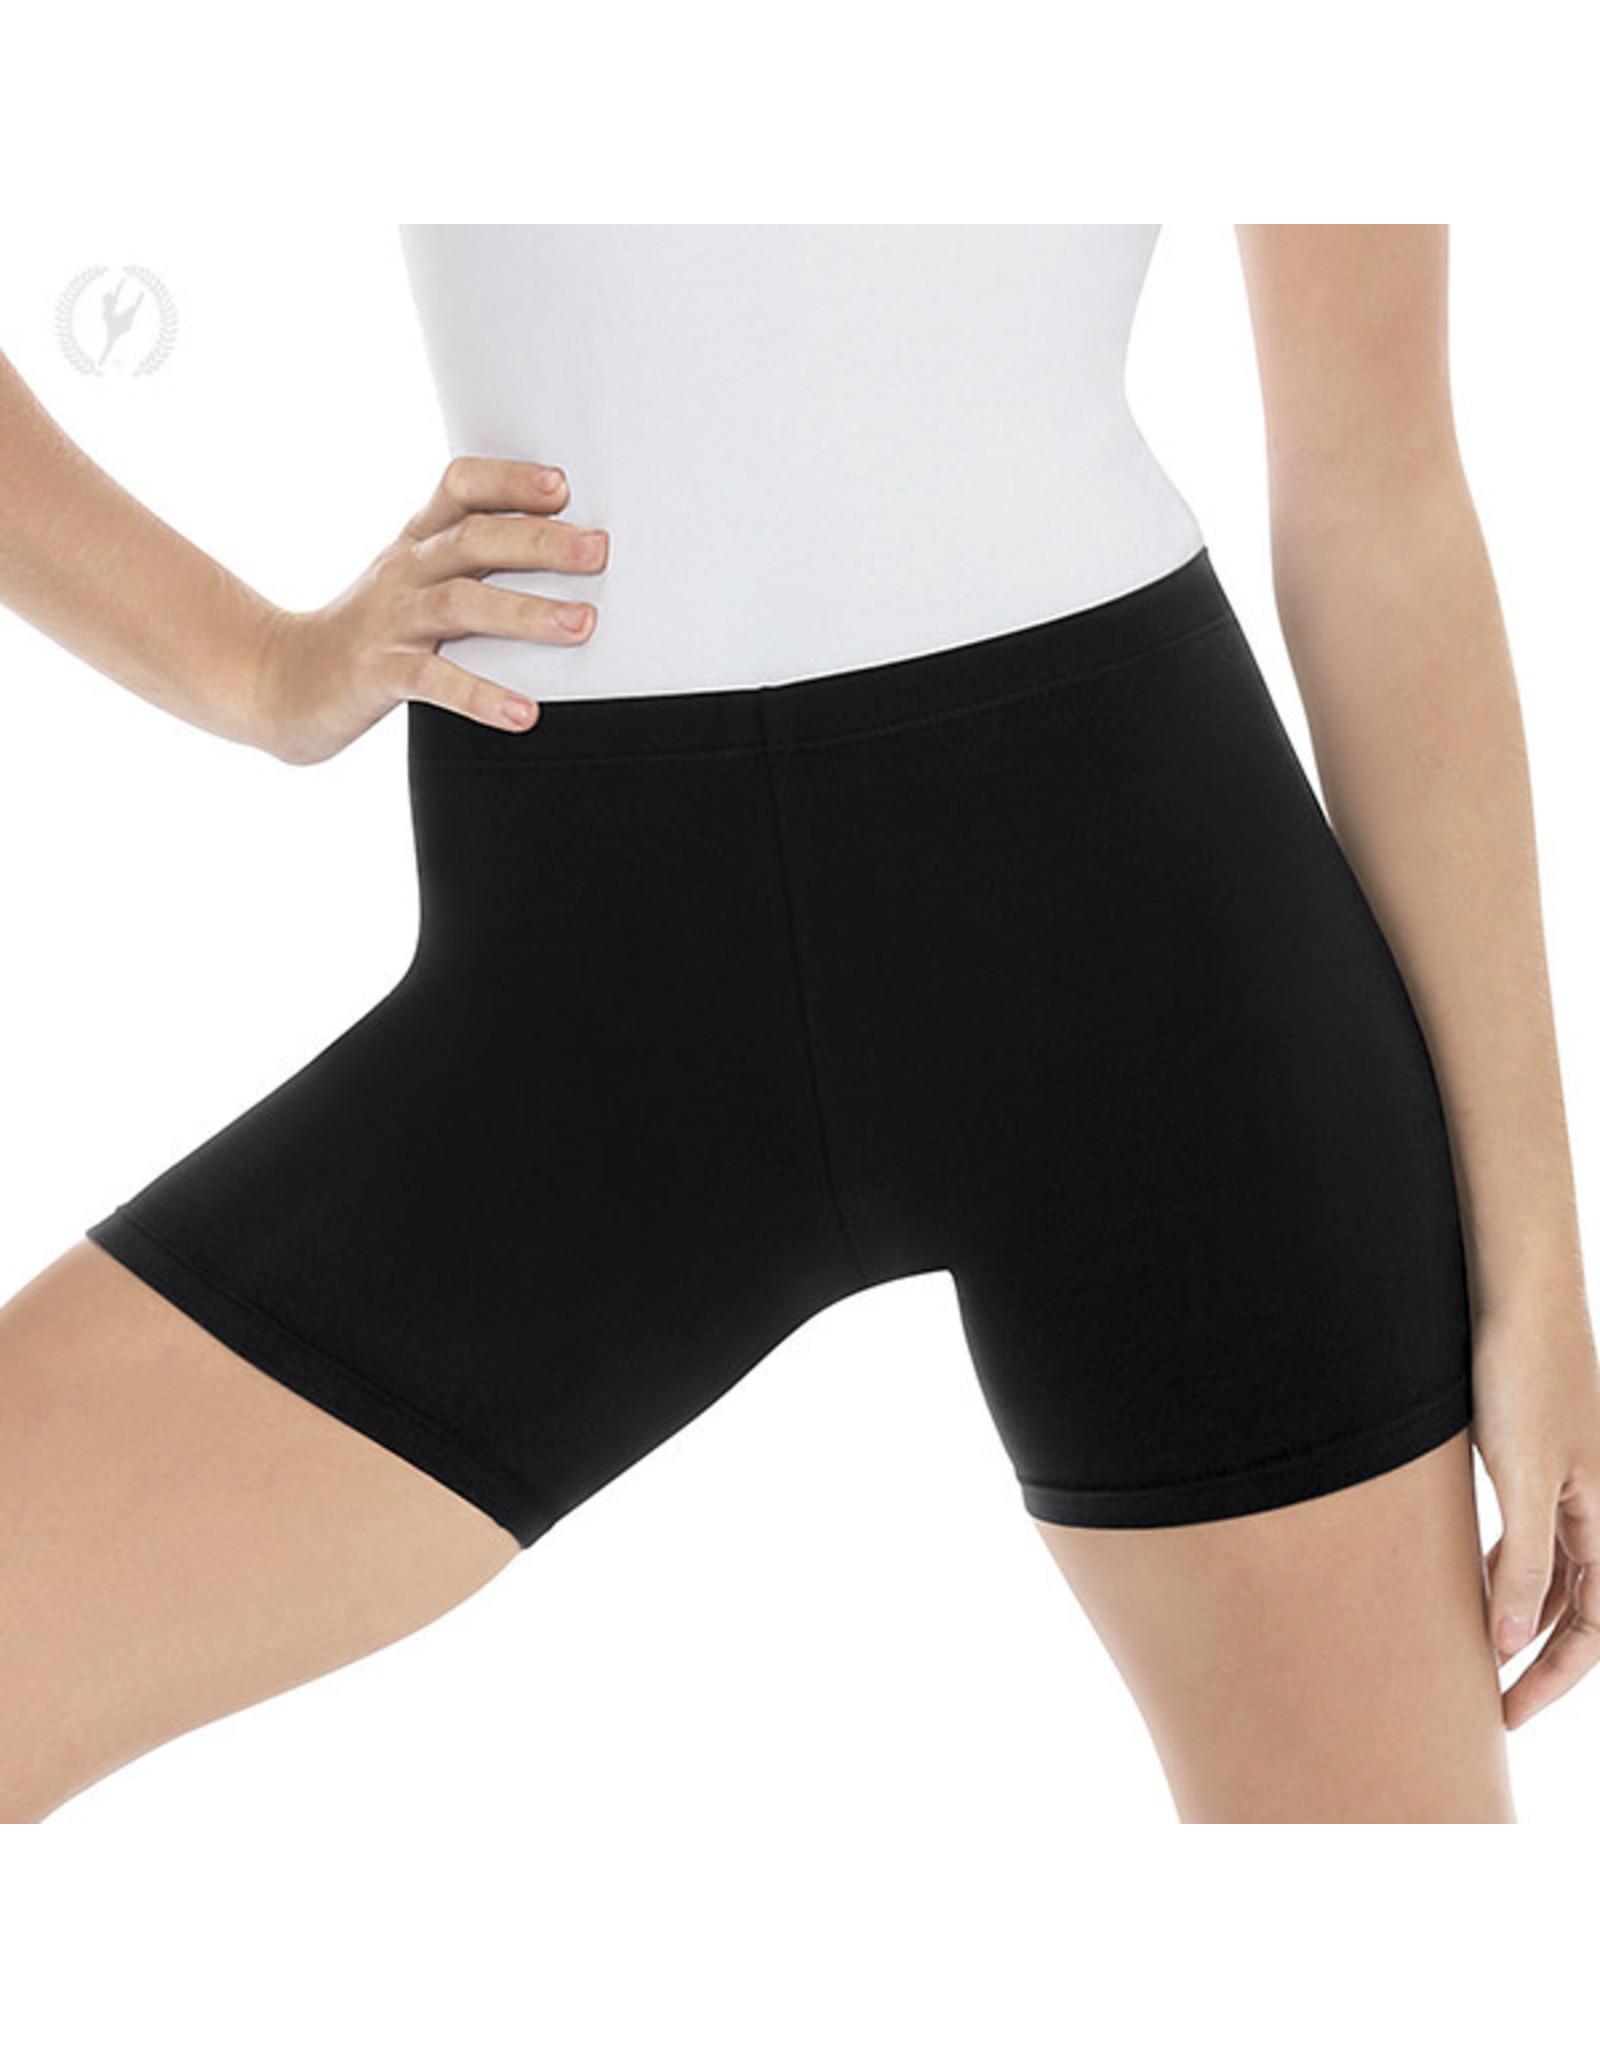 Eurotard 10331 Womens Mid Thigh Biker Shorts Black